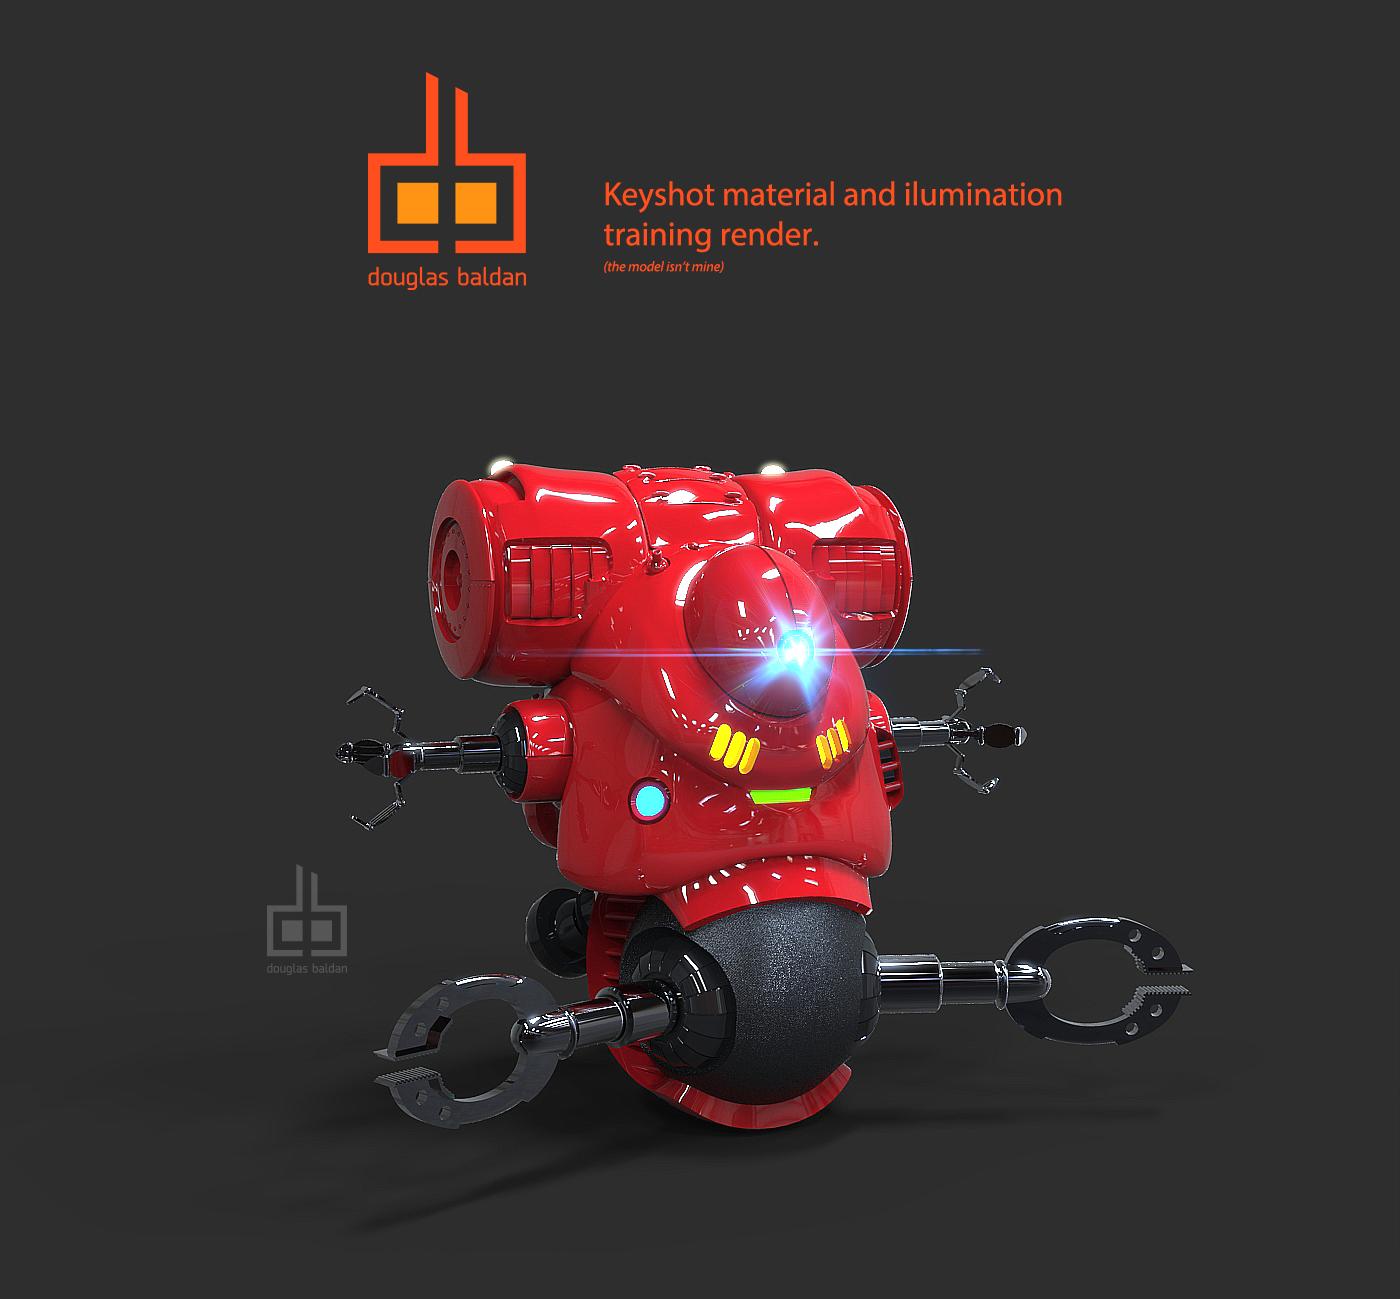 drone-keyshot